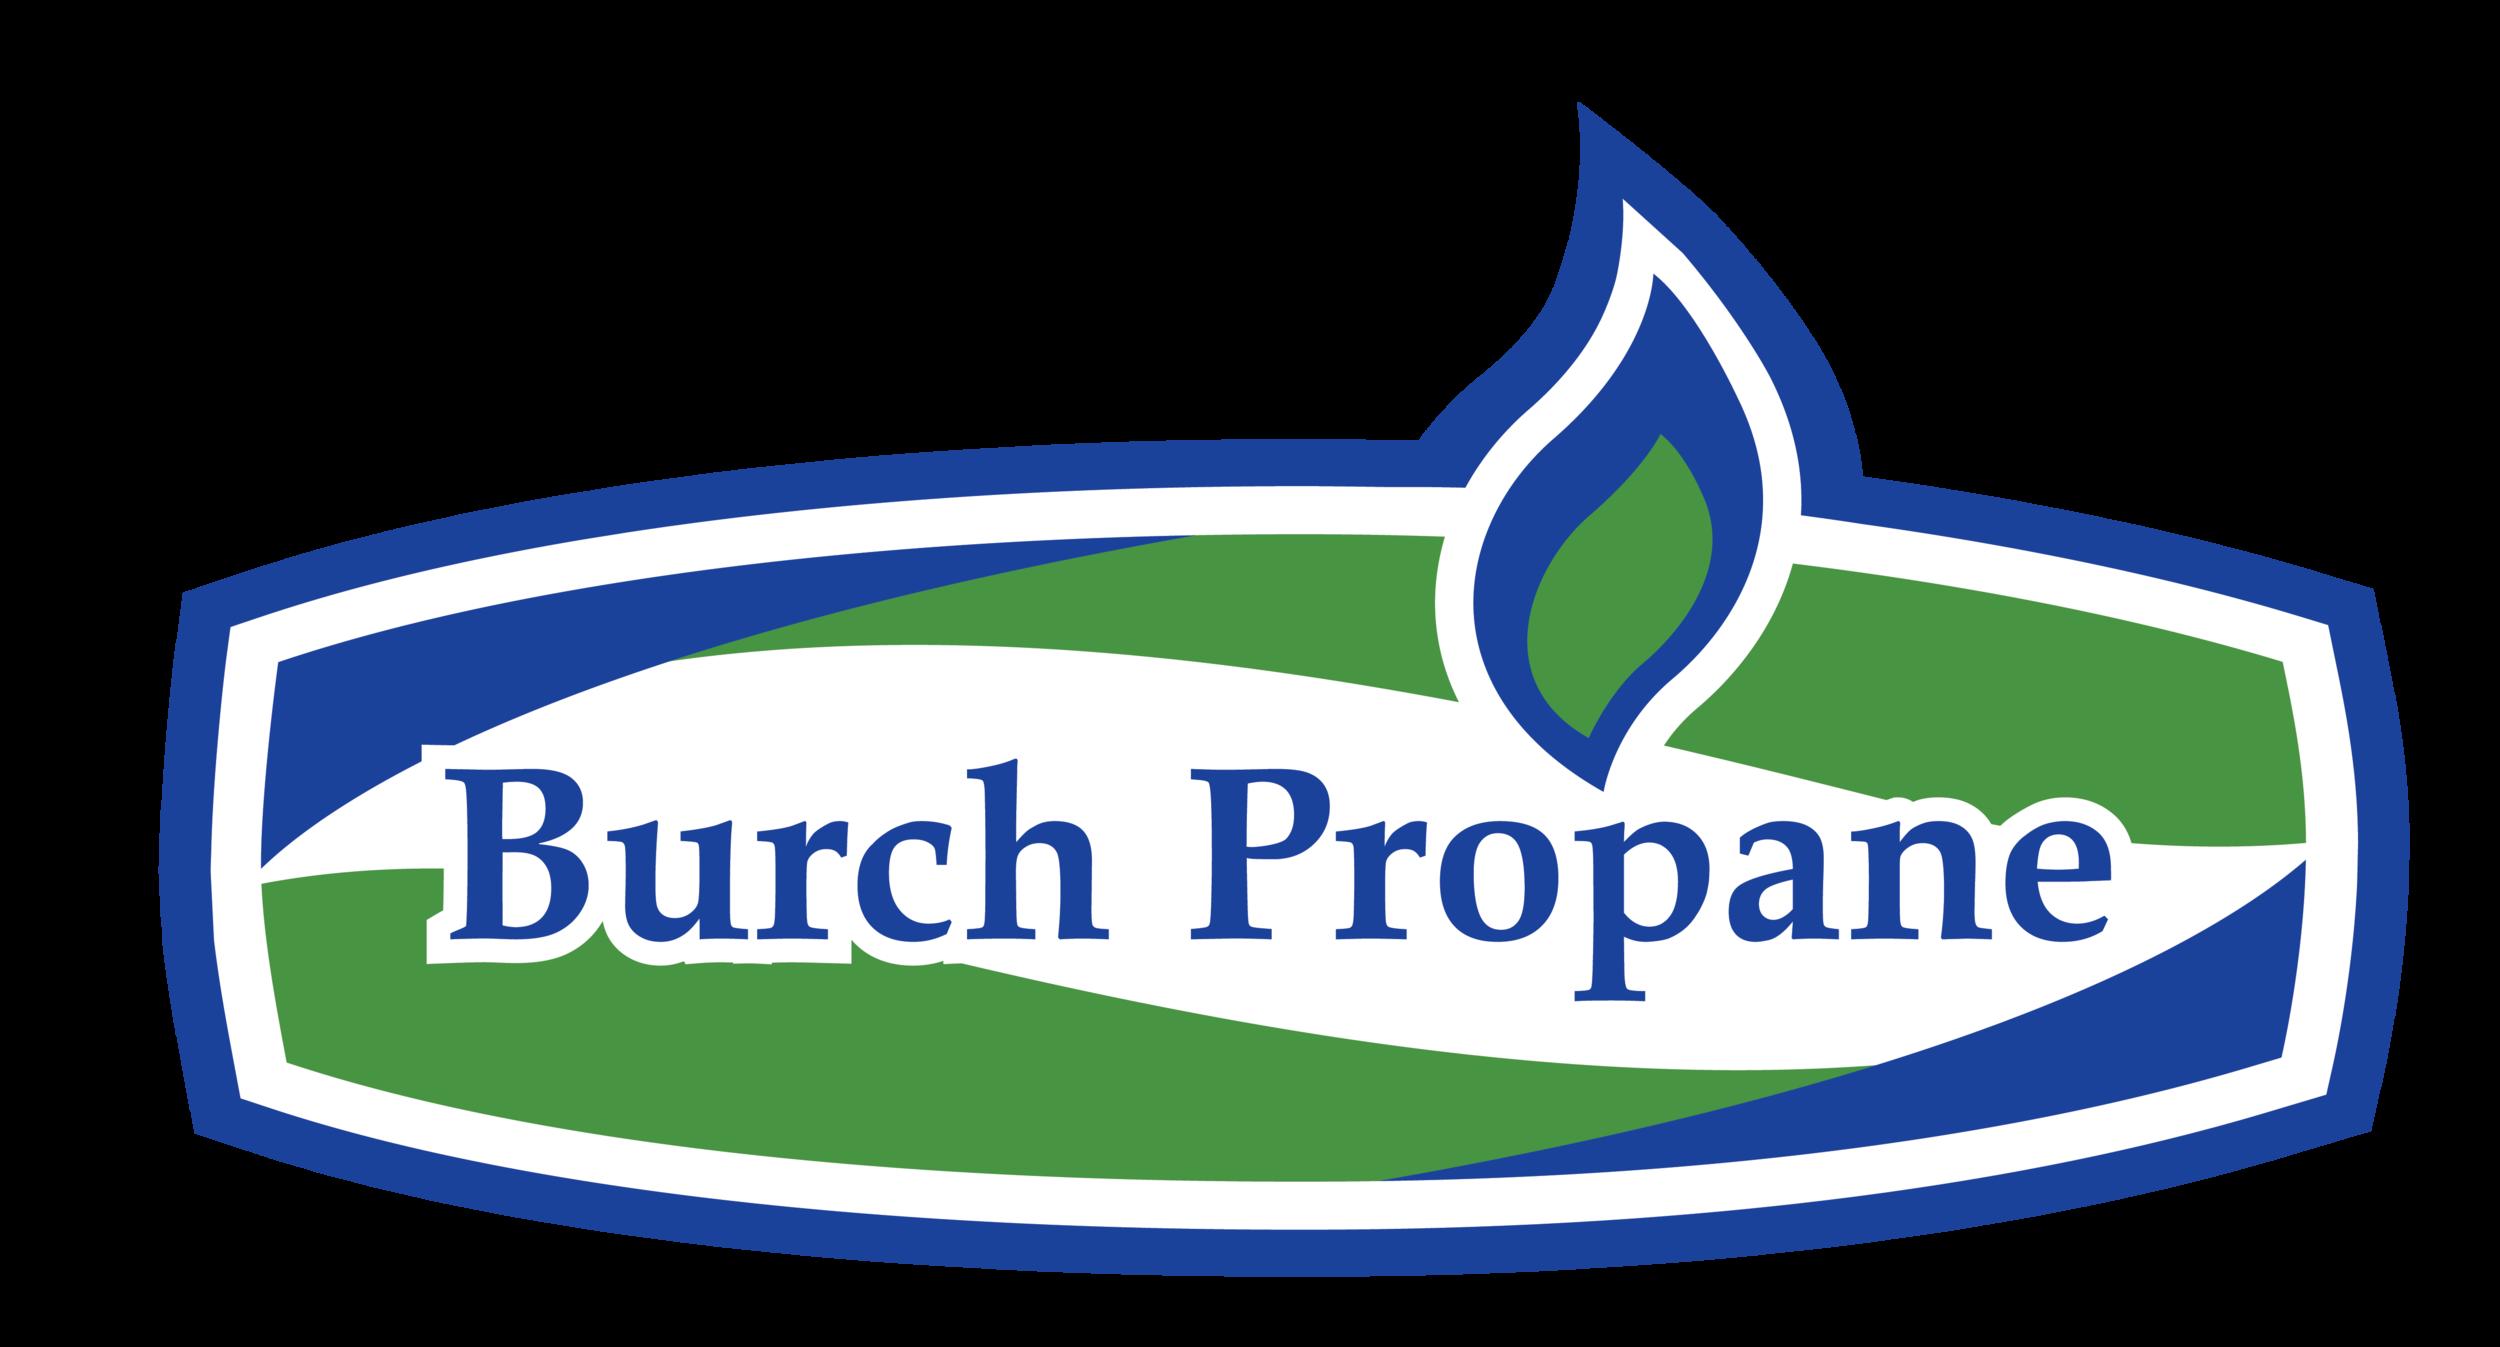 Burch_propane_updated-01.png